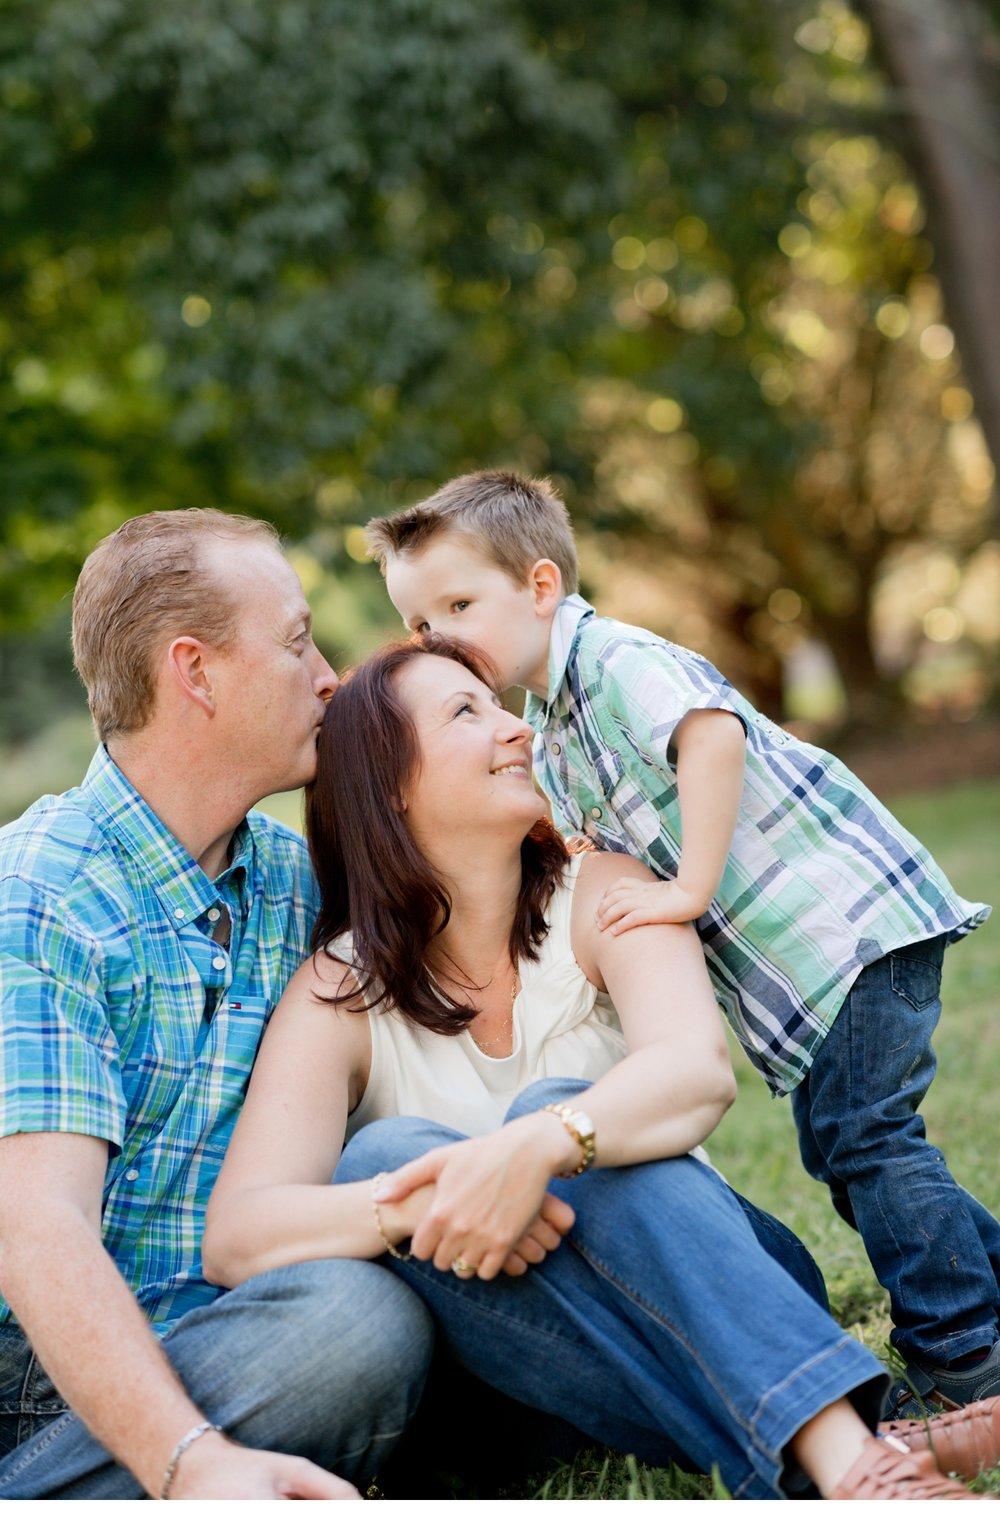 bec-stewart-family-lifestyle-photographer.jpg